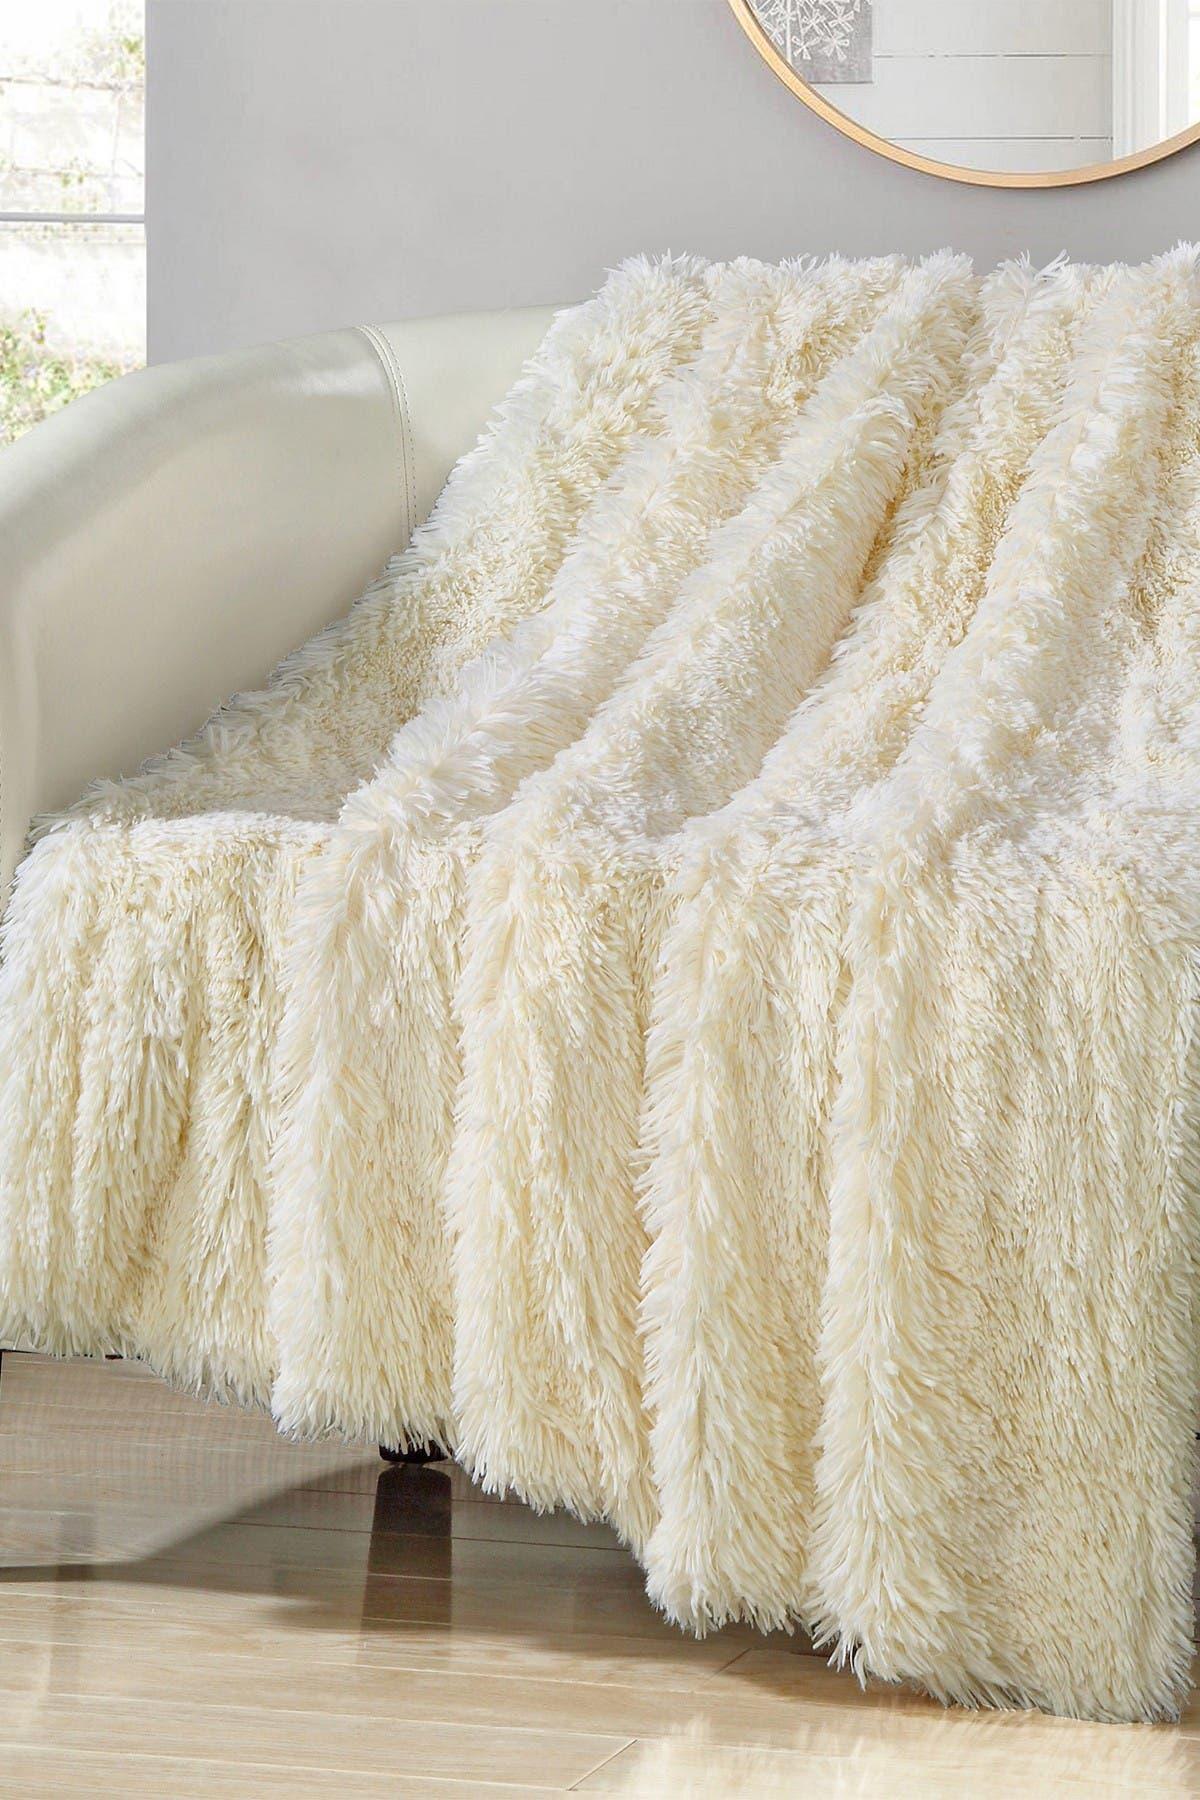 Image of Chic Home Bedding Beige Alaska Faux Fur Throw Blanket